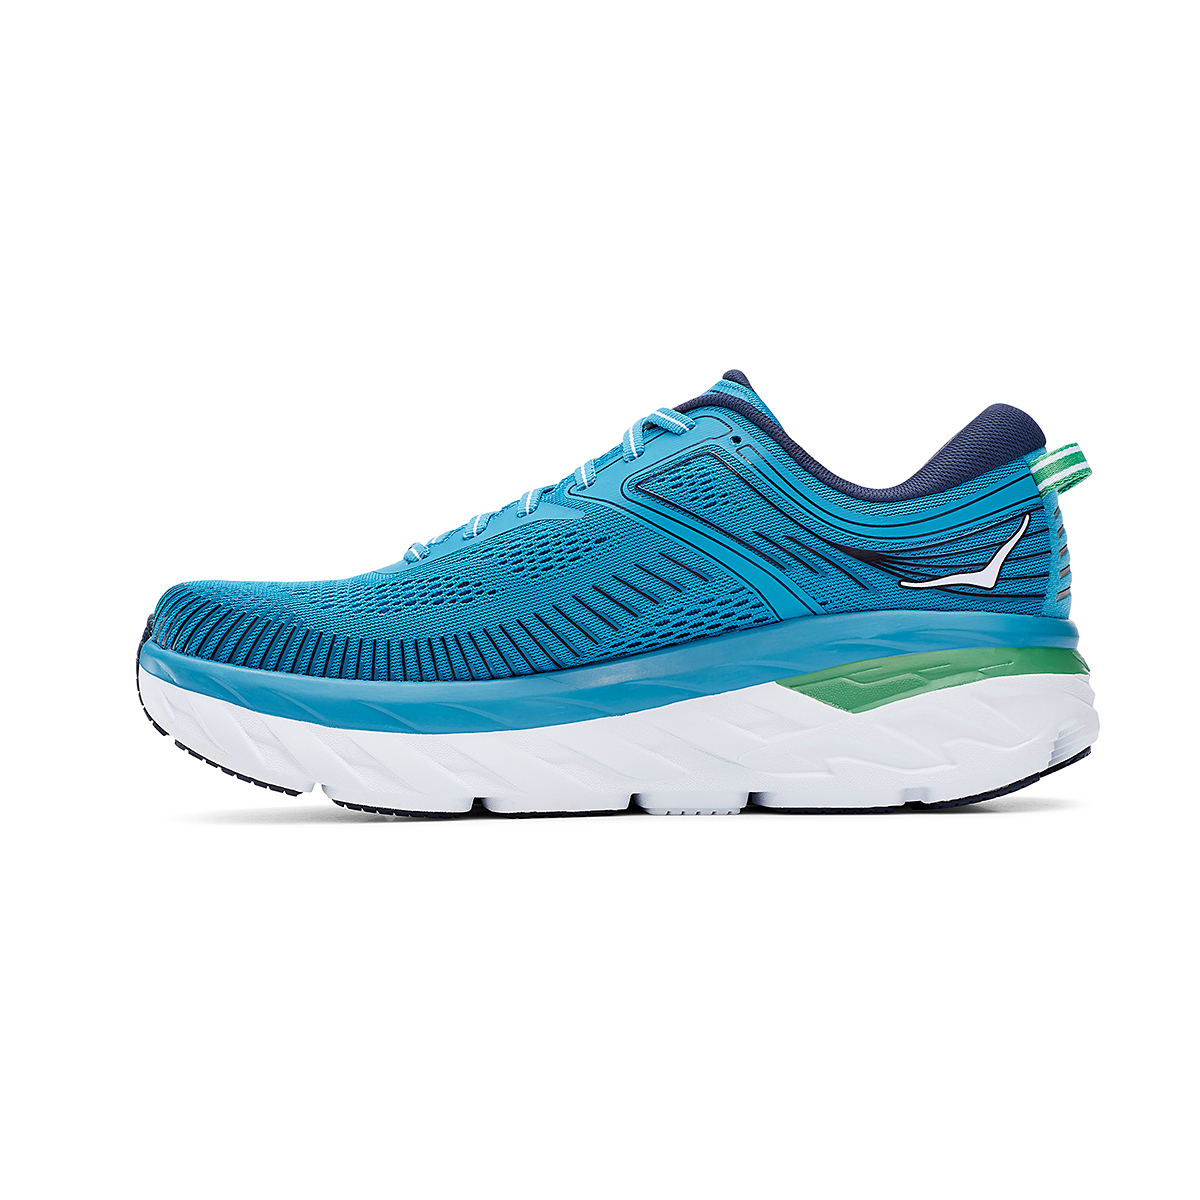 Men's Hoka One One Bondi 7 Running Shoe - Color: Blue Moon/Moonlit Ocean - Size: 7 - Width: Regular, Blue Moon/Moonlit Ocean, large, image 2